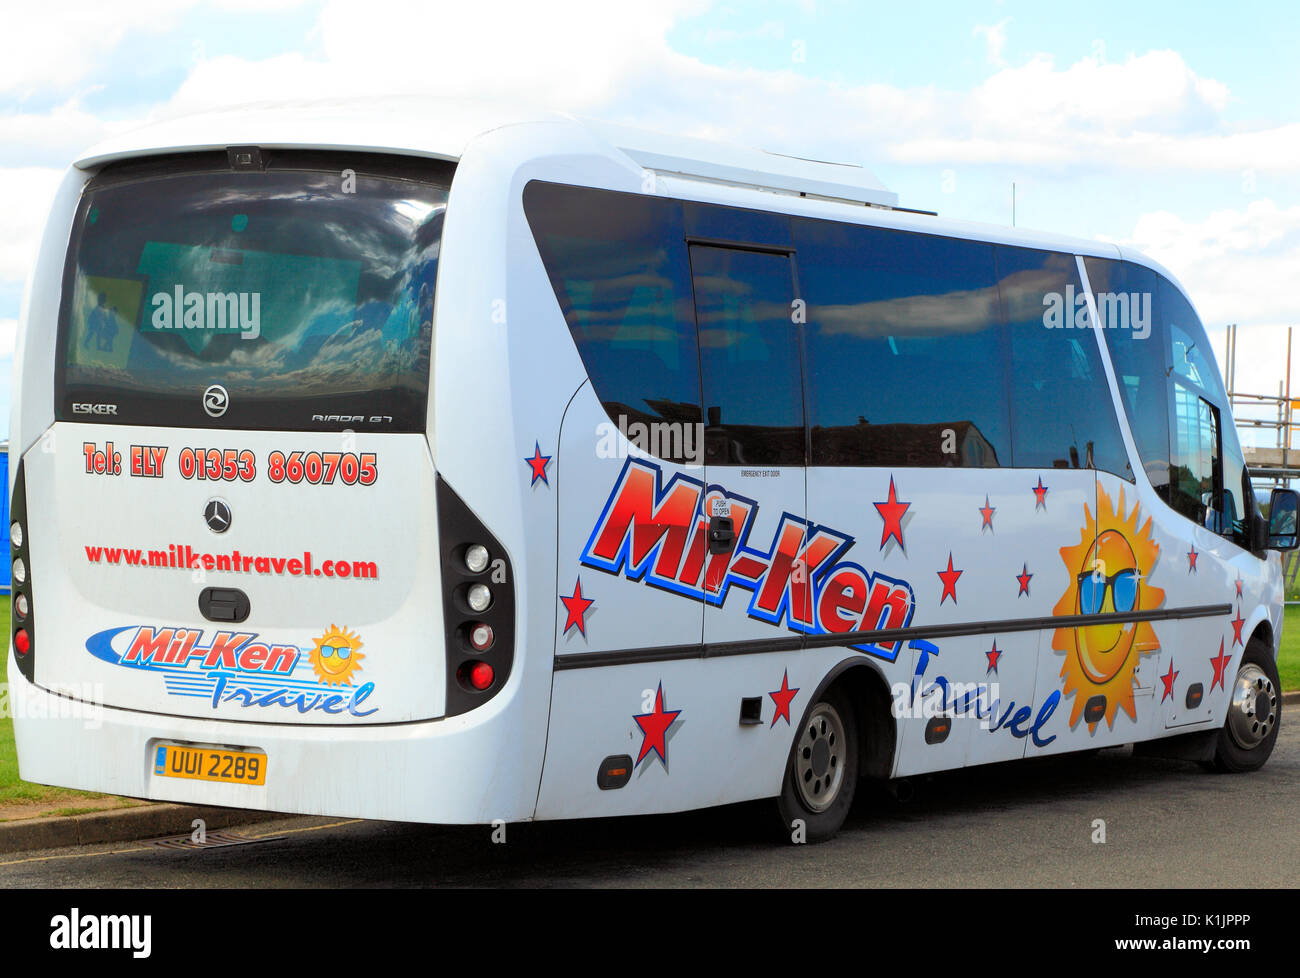 Viajes Mil-Ken, mini autobuses, autocares, excursiones de un día, excursiones, viajes, excursiones, empresa de viajes, empresas, Inglaterra, Reino Unido. Imagen De Stock